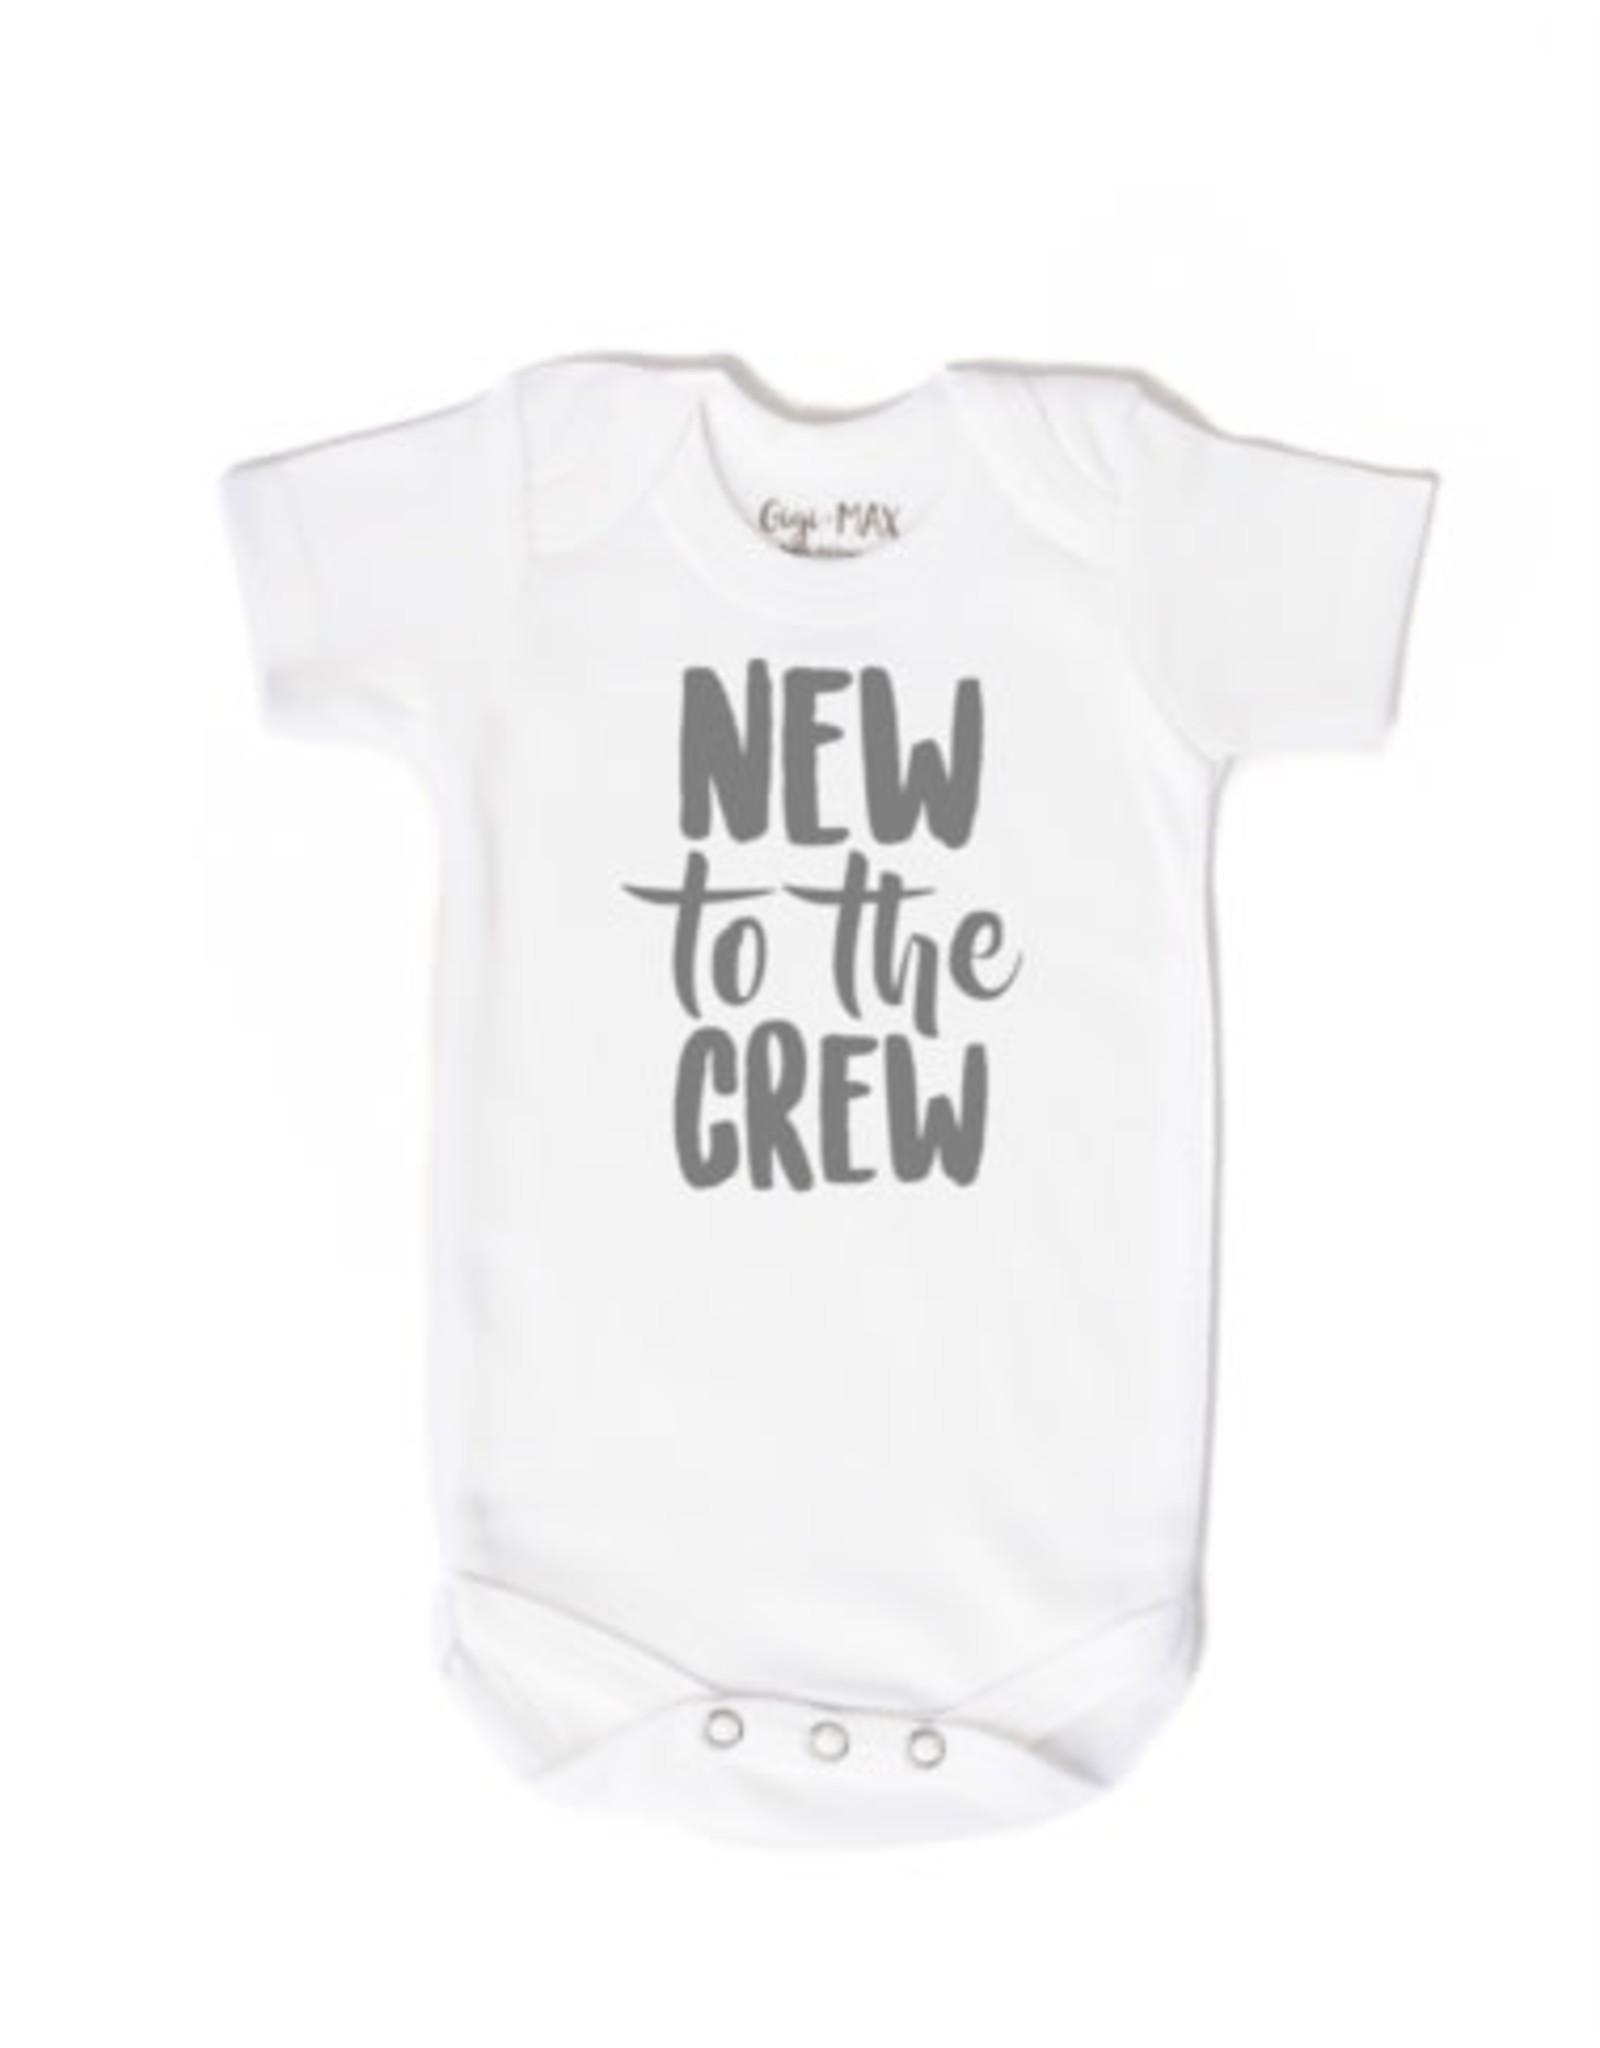 Gigi & Max Gigi & Max- New to the Crew S/S Newborn Onesie: Gray